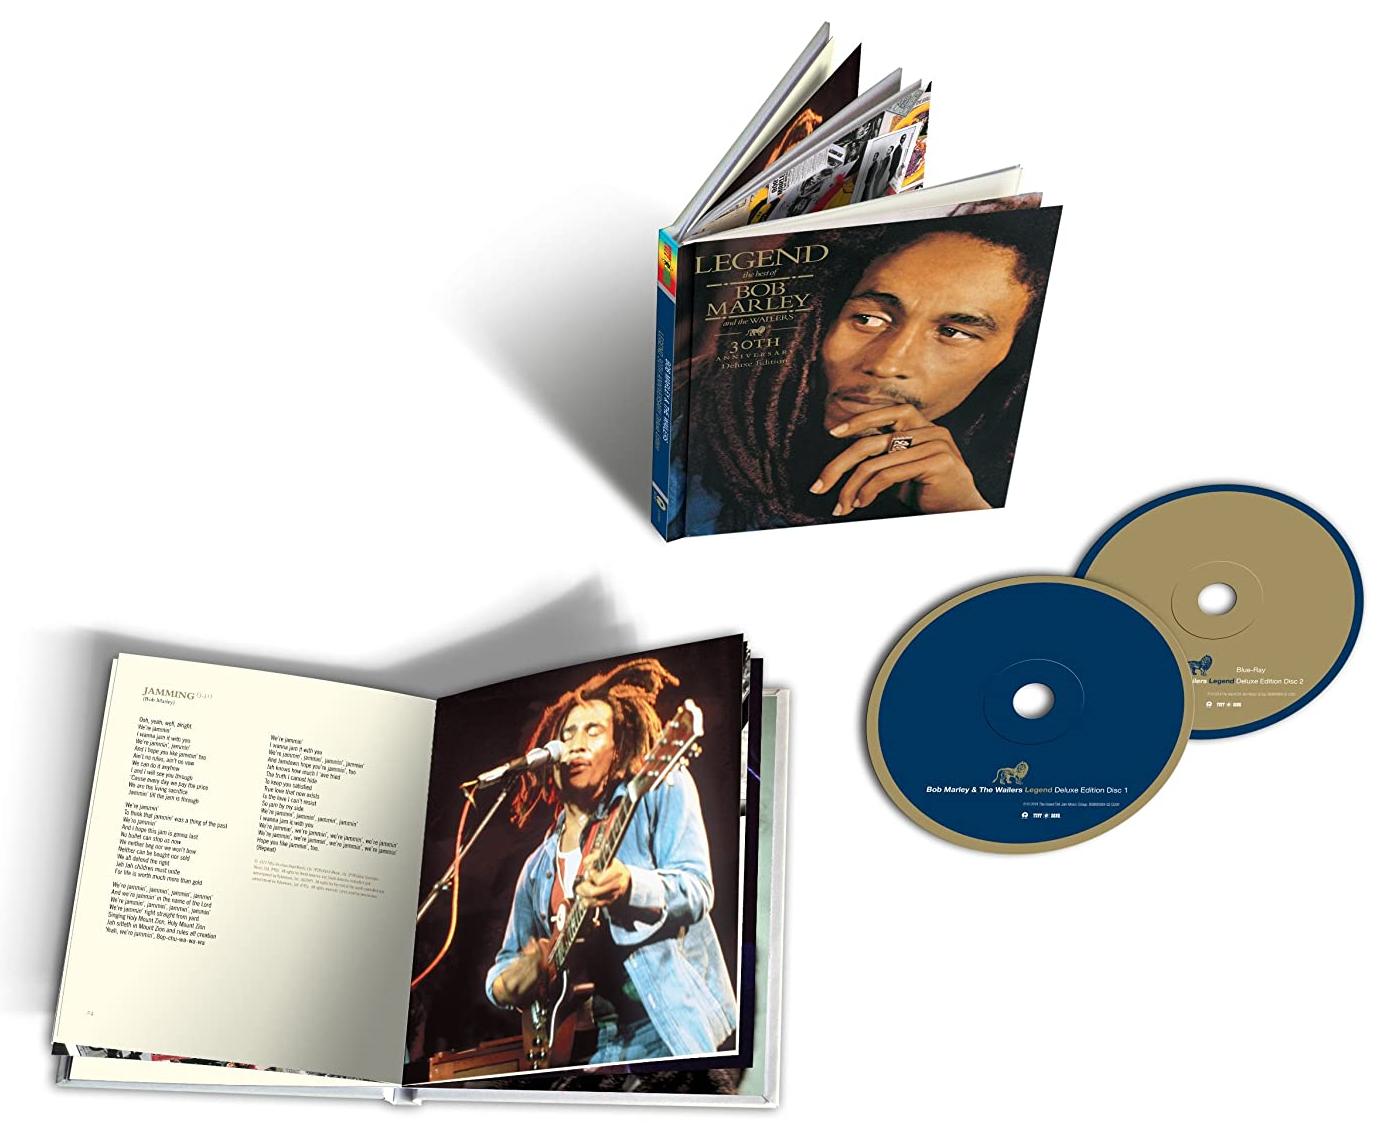 Bob Marley - Legend (Limited 30th Anniversary Edition) (CD + Blu-ray Audio) (Amazon)